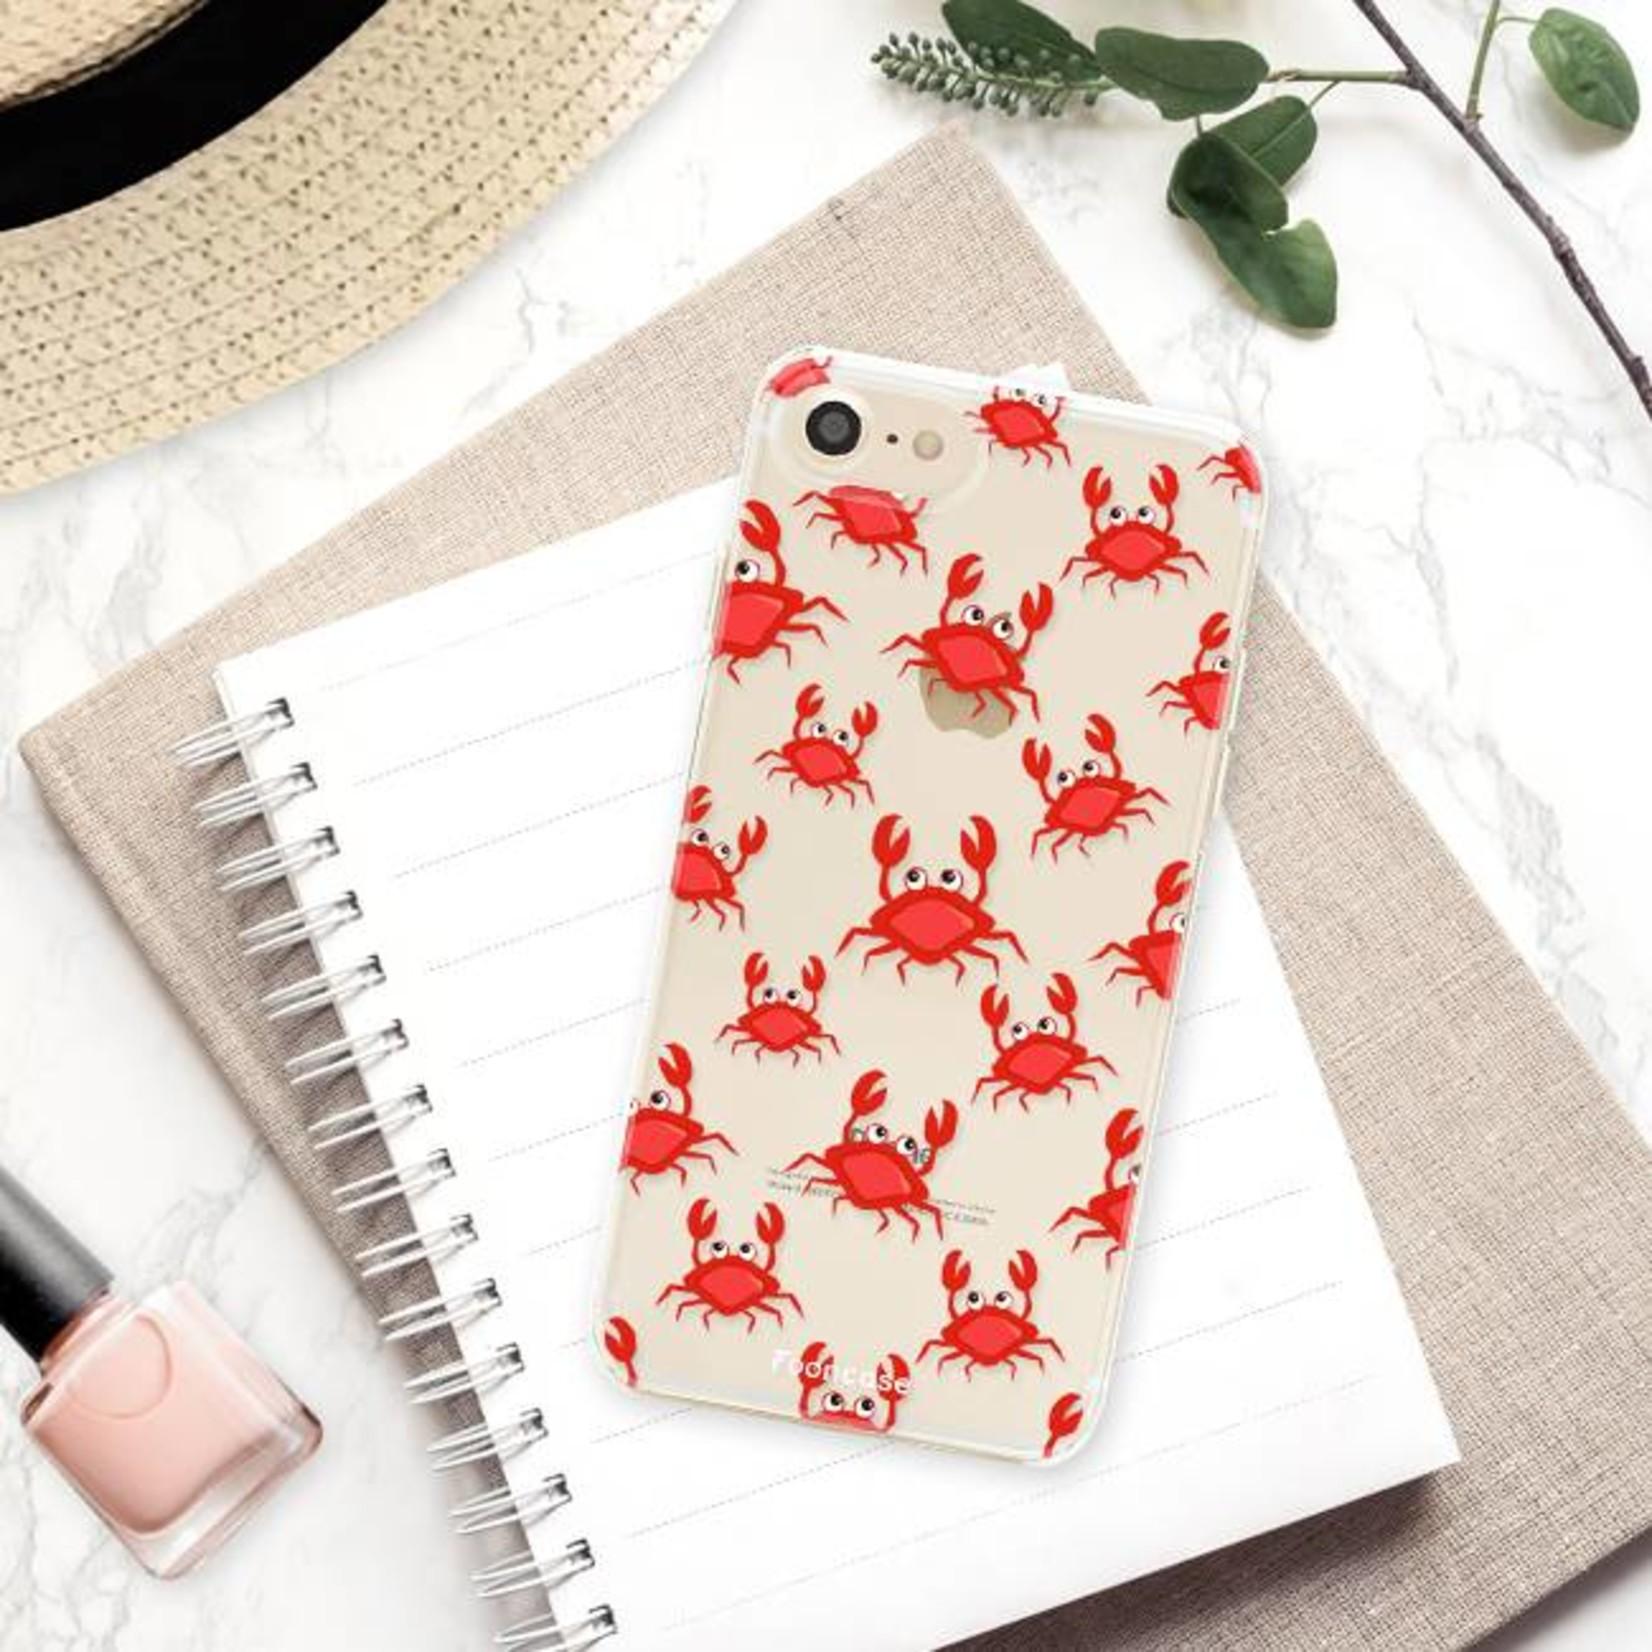 FOONCASE iPhone SE (2020) hoesje TPU Soft Case - Back Cover - Crabs / Krabbetjes / Krabben